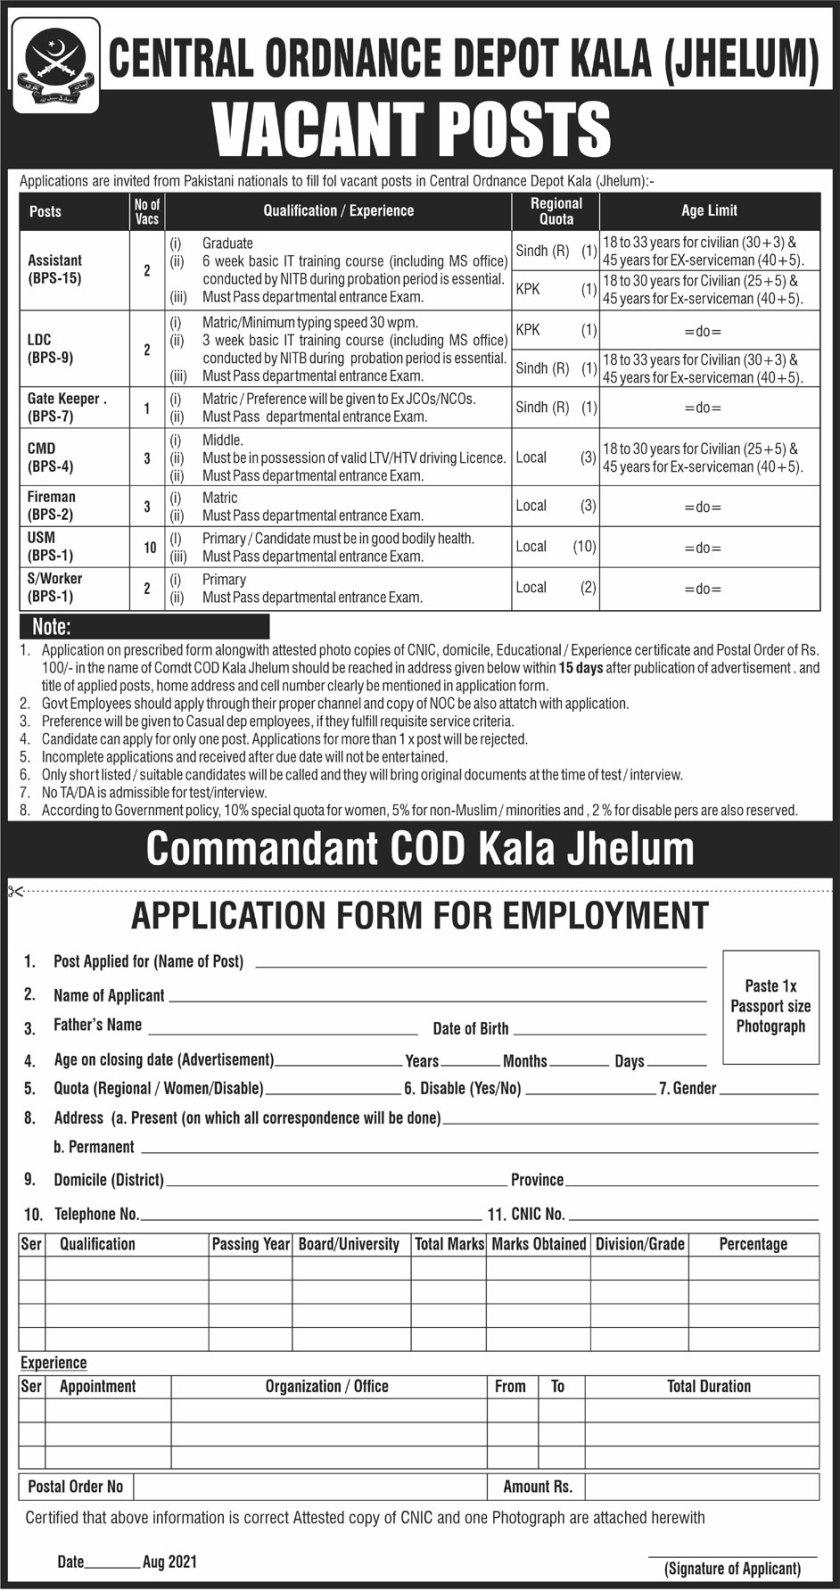 COD Kala Jhelum Jobs 2021 Central Ordnance Depot